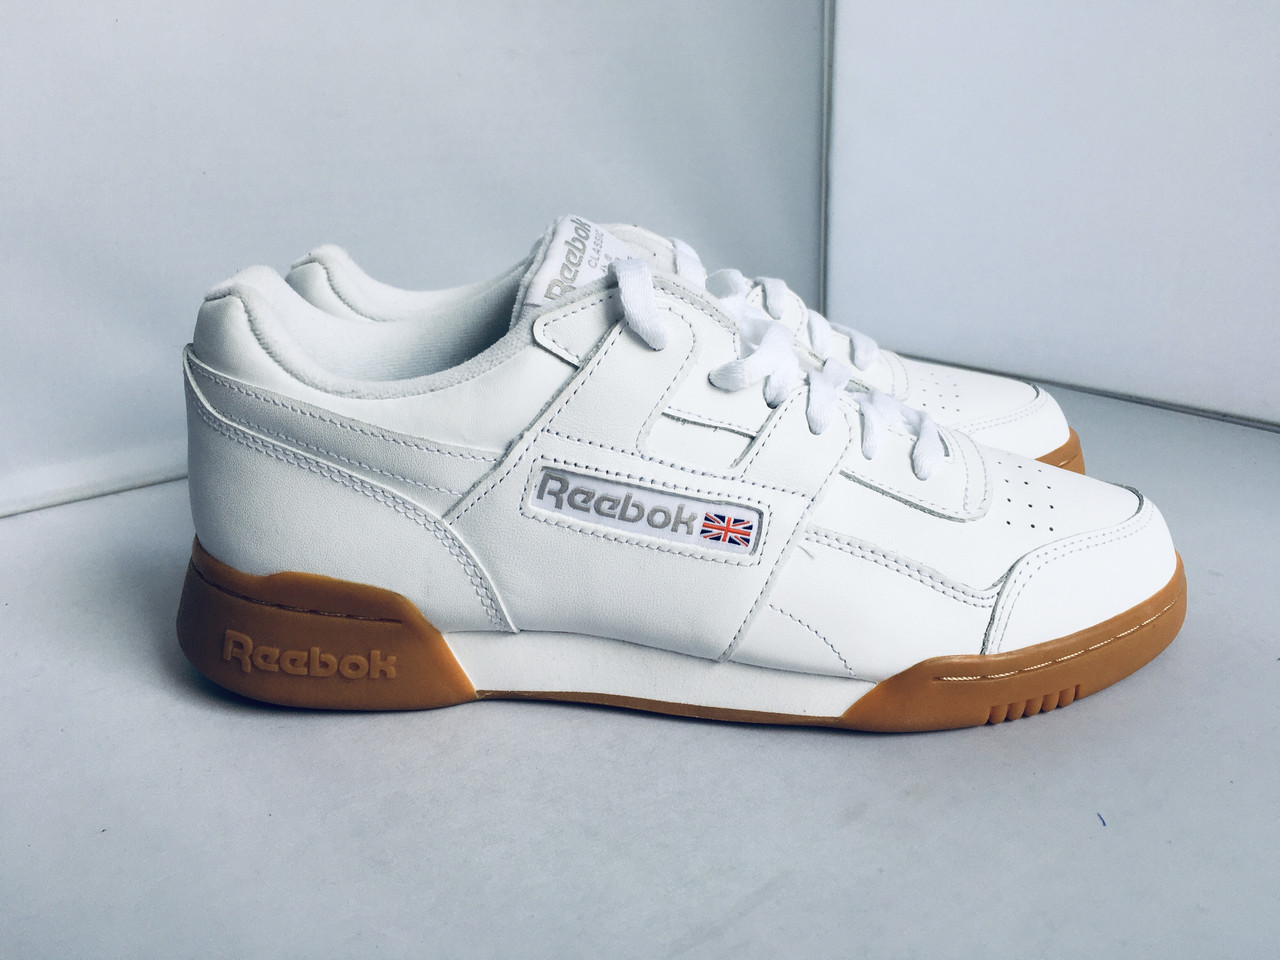 Мужские кроссовки, Reebok Classic, 42 размер